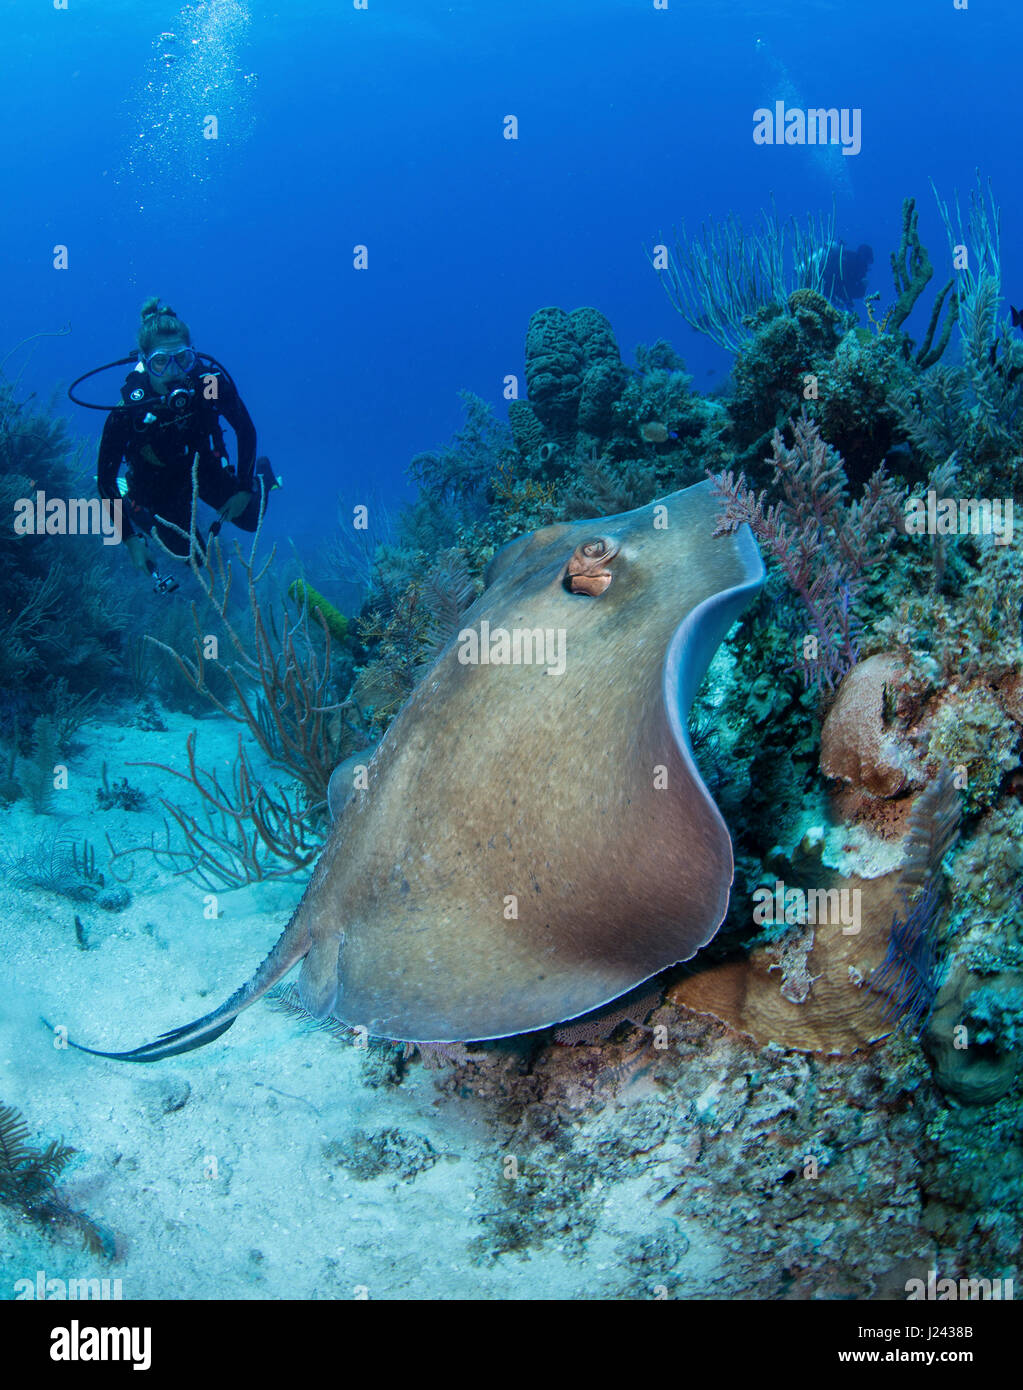 Scuba Diver Uhren Stingray, als er über Riff schwimmt. Stockbild